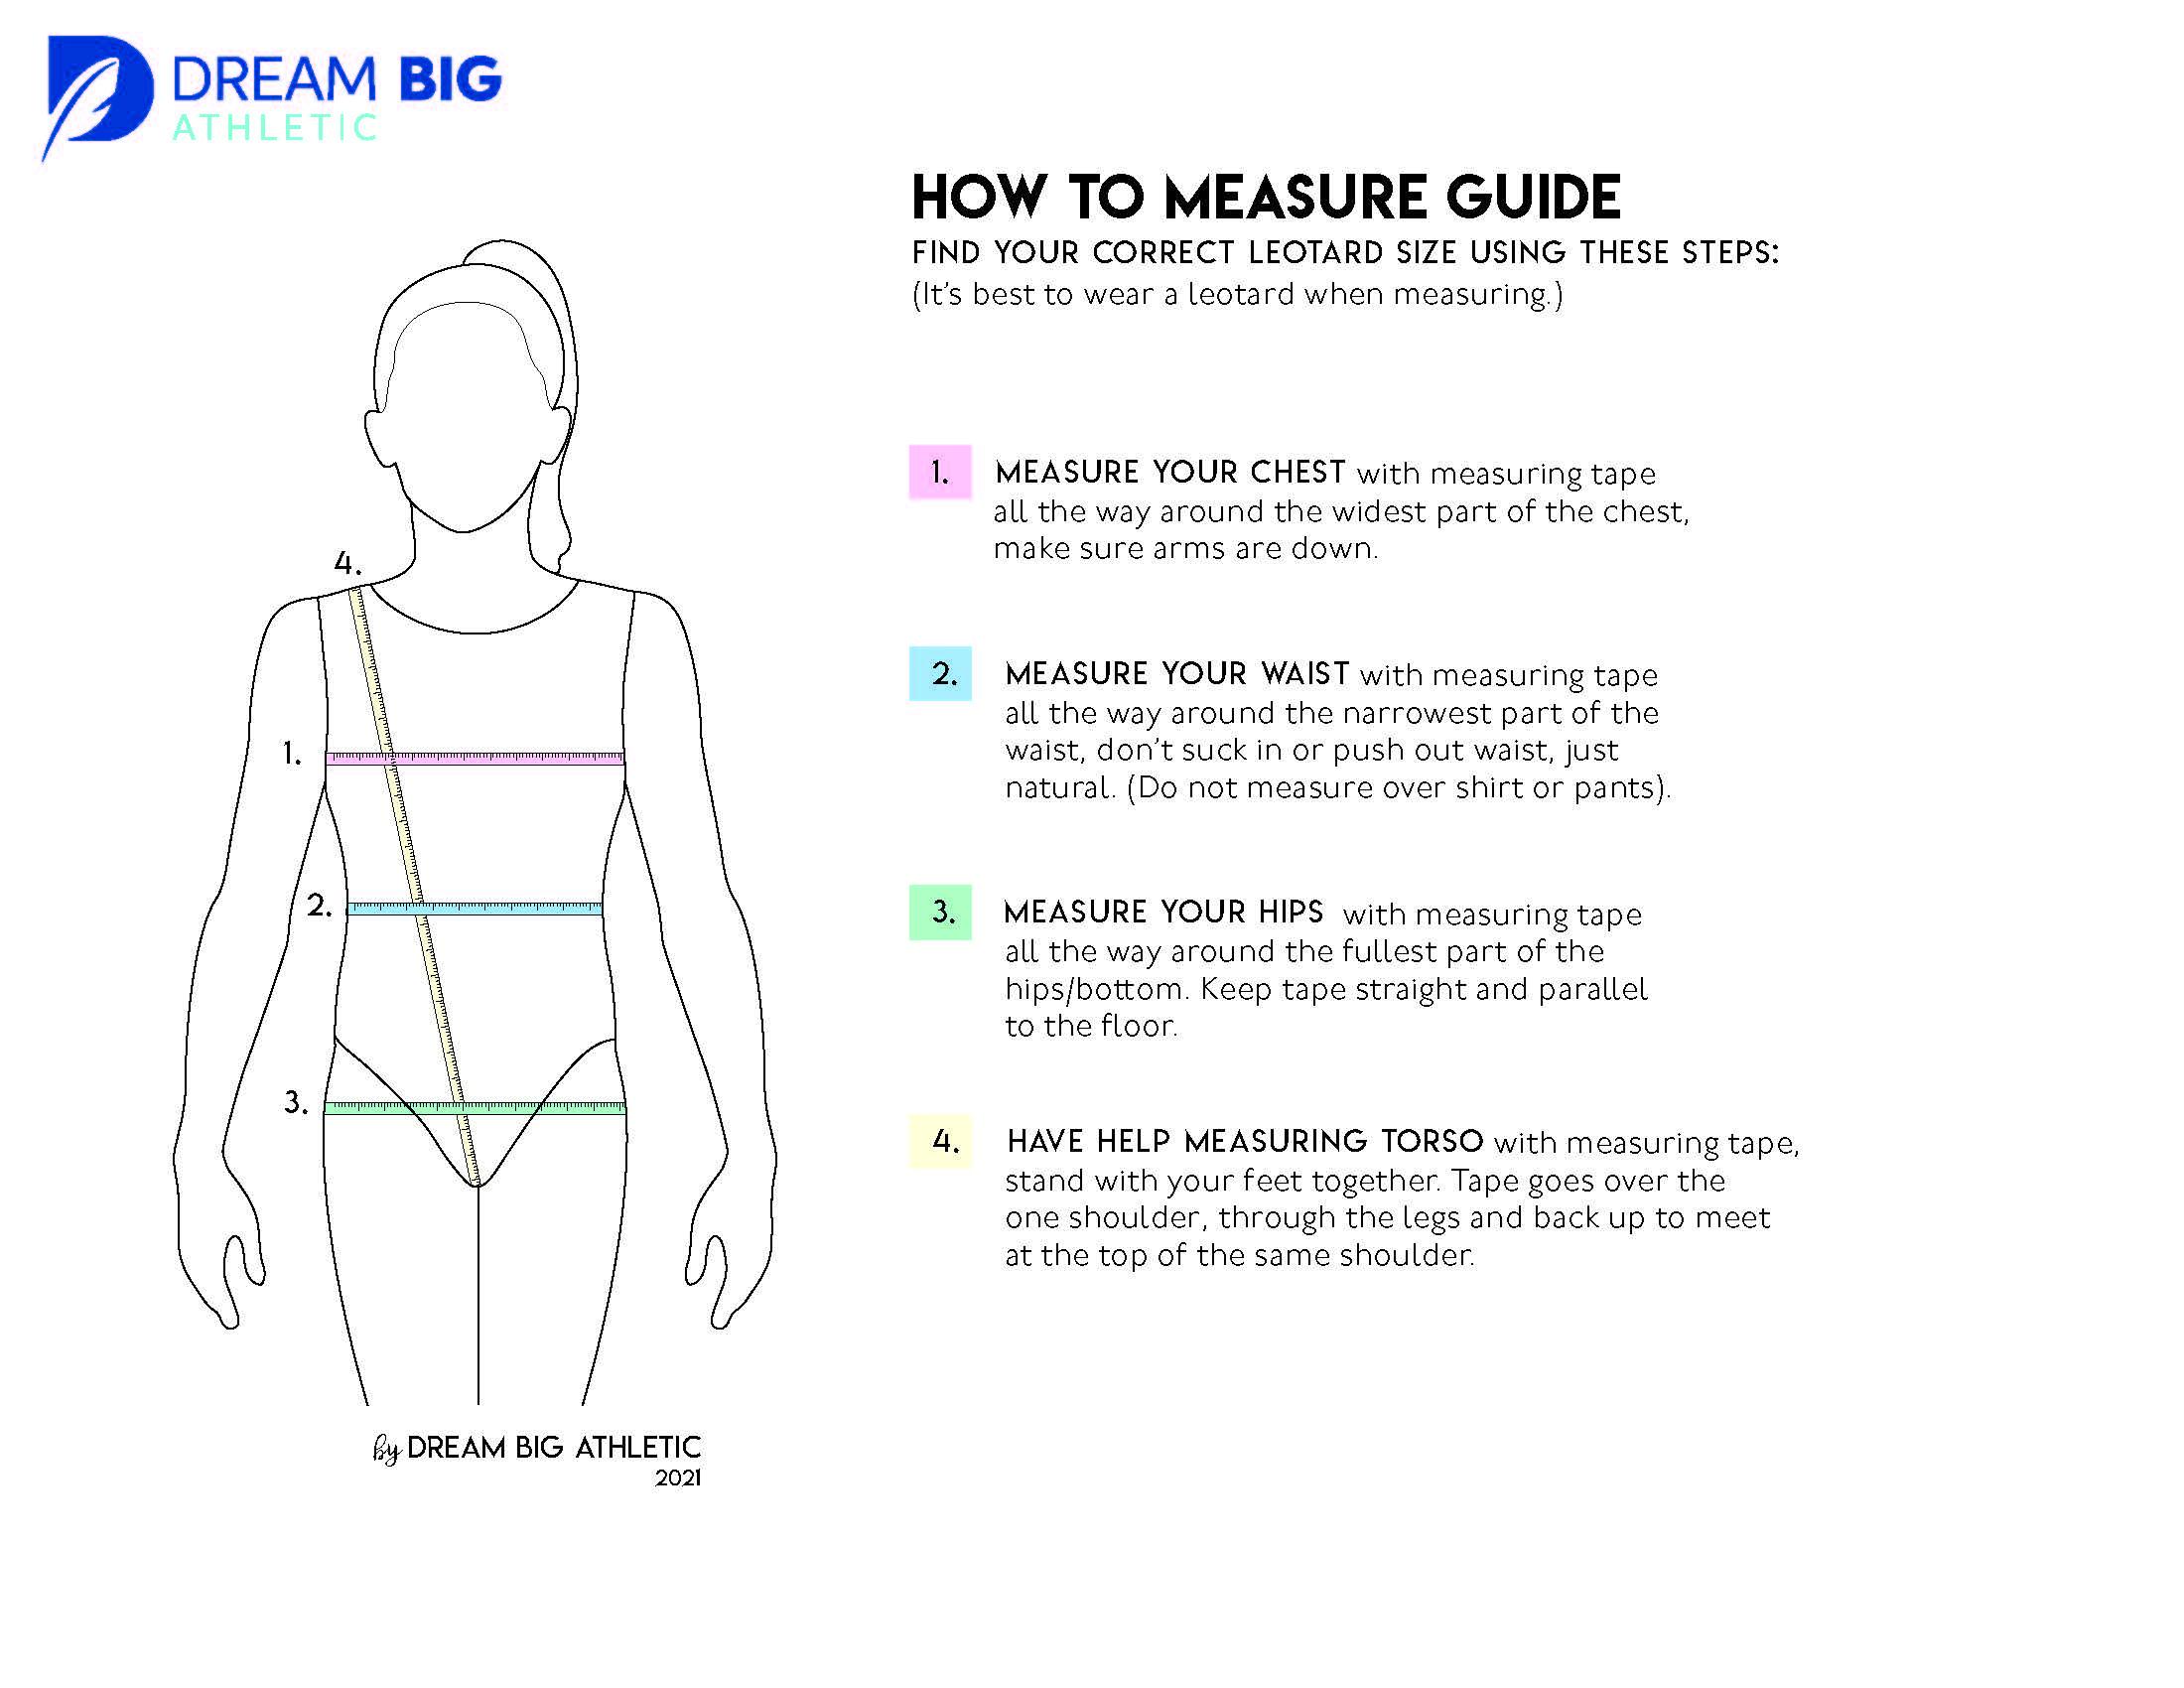 how-to-measure-guide.pdf-69-.jpg